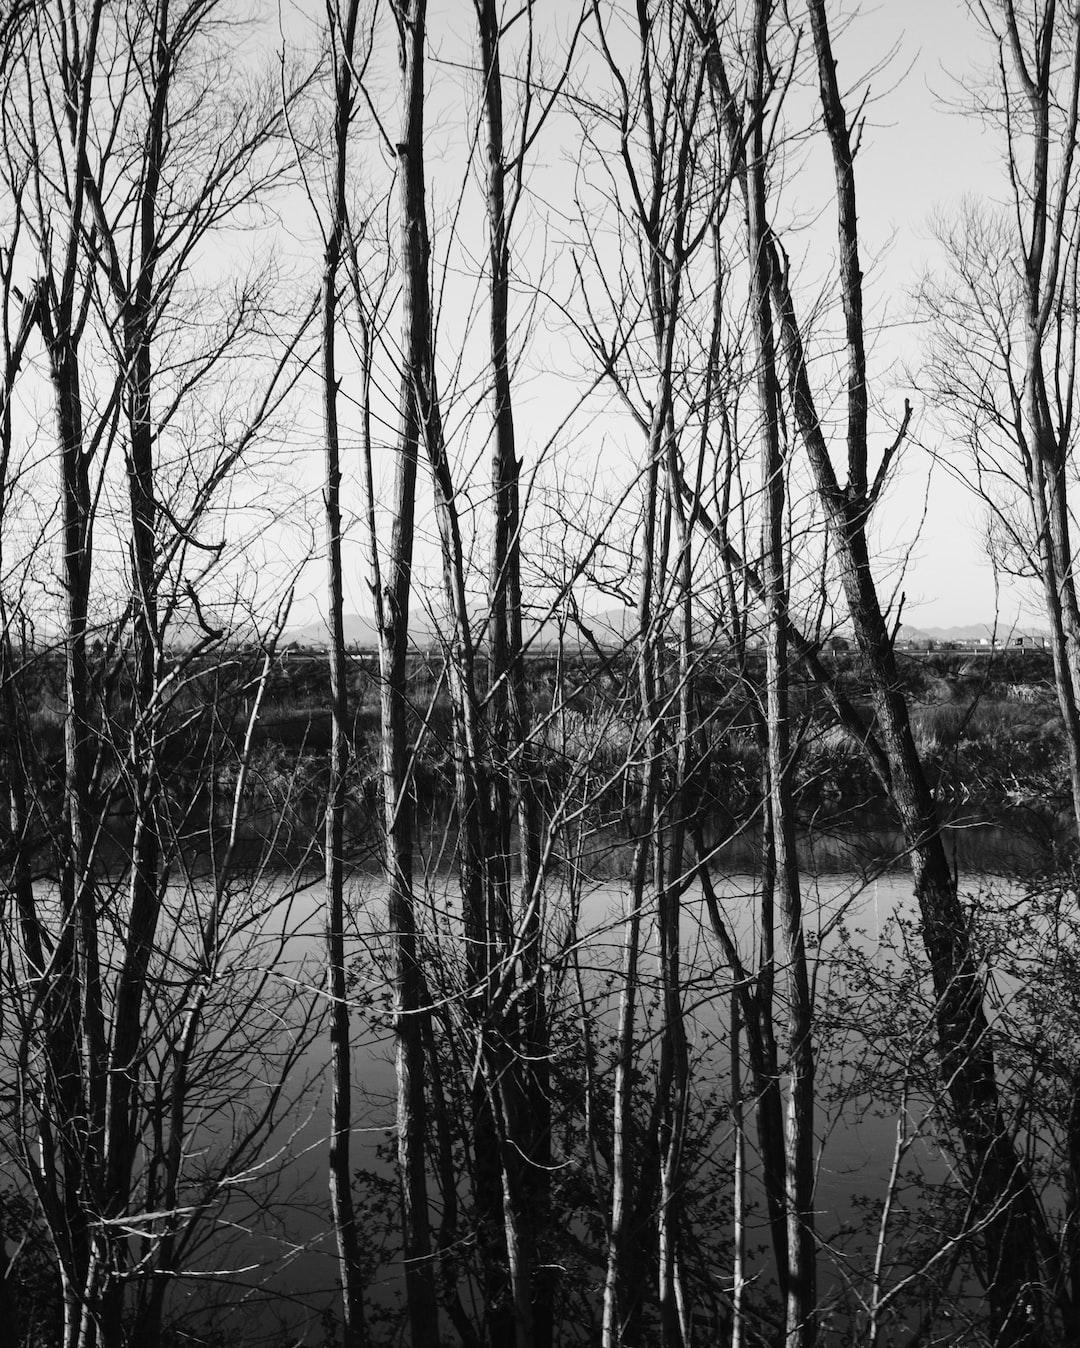 Trees along a river